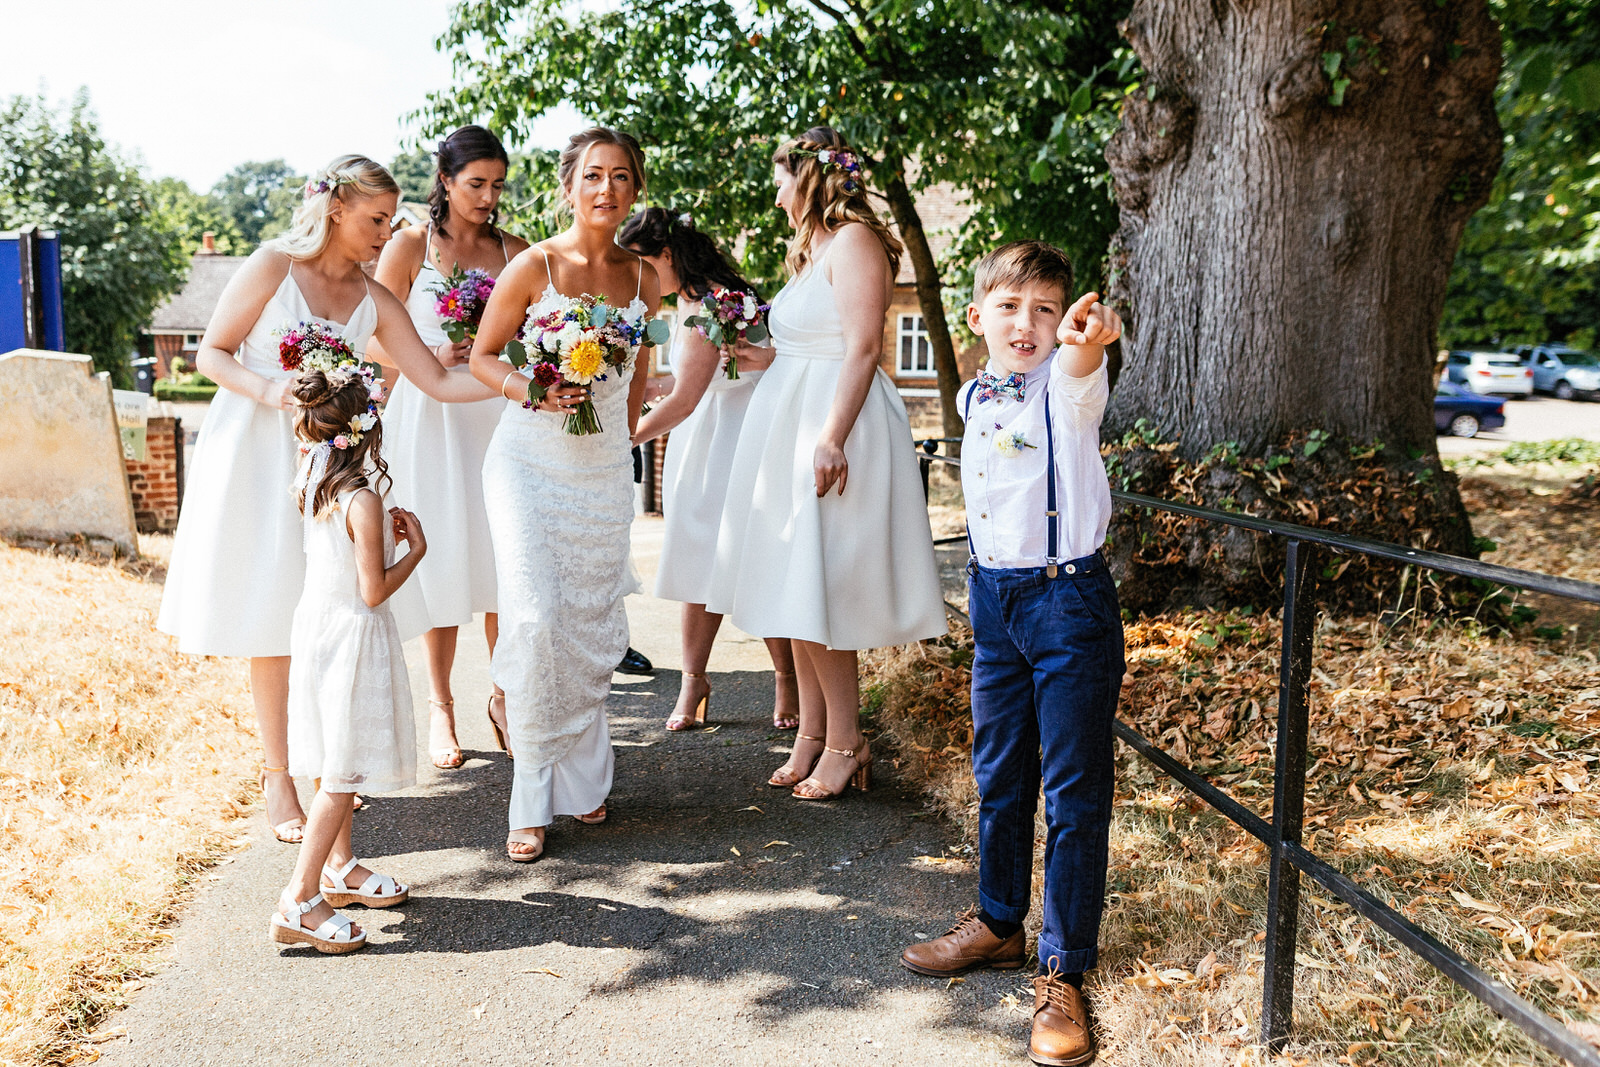 Edworth-Manor-Farm-Wedding-Photographer-011.jpg